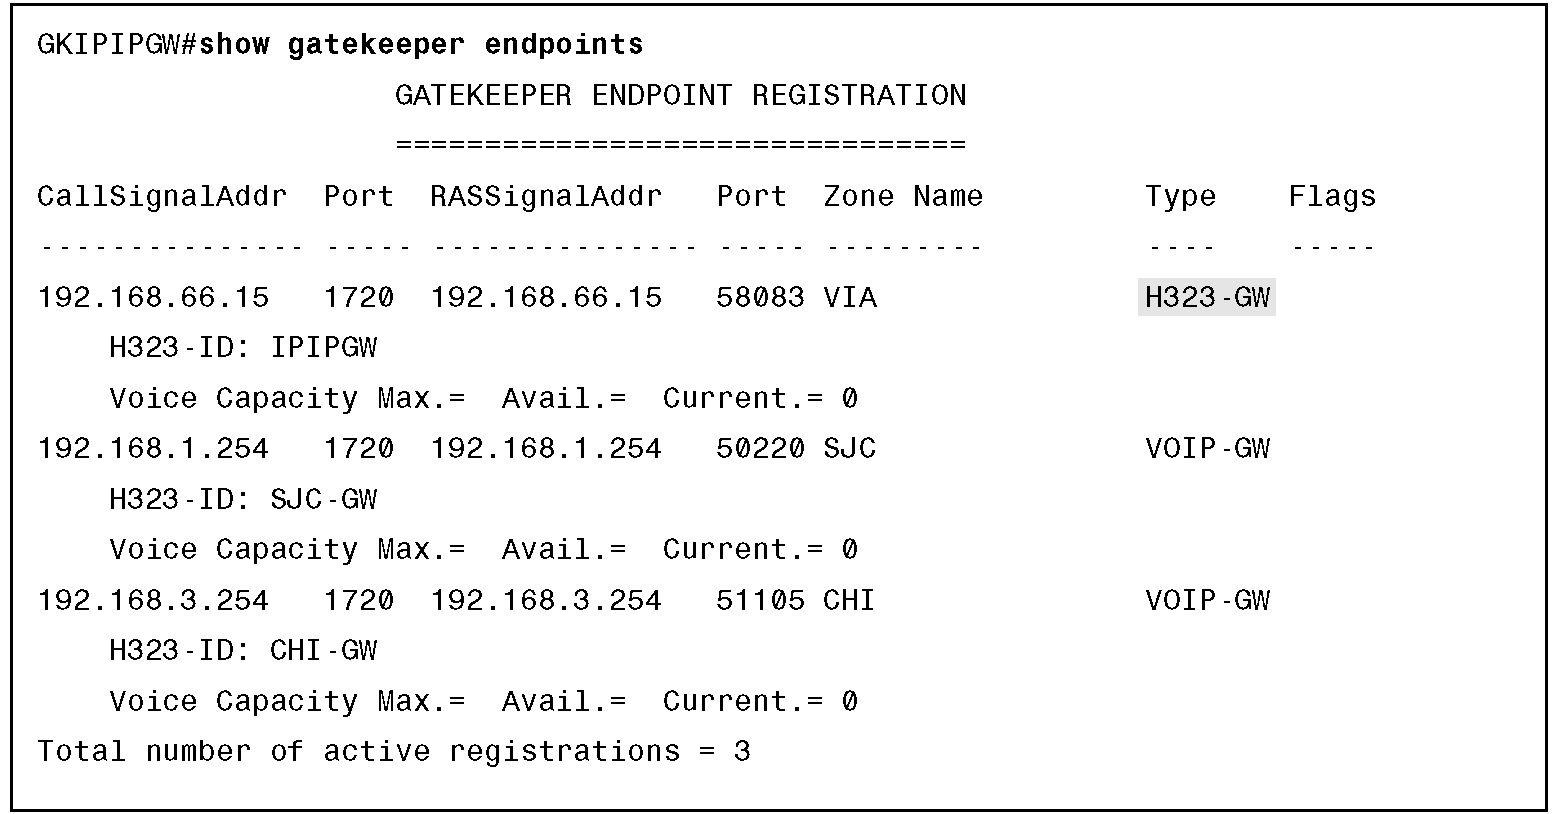 Configuring Cisco Unified Border Elements (Establishing a Connection